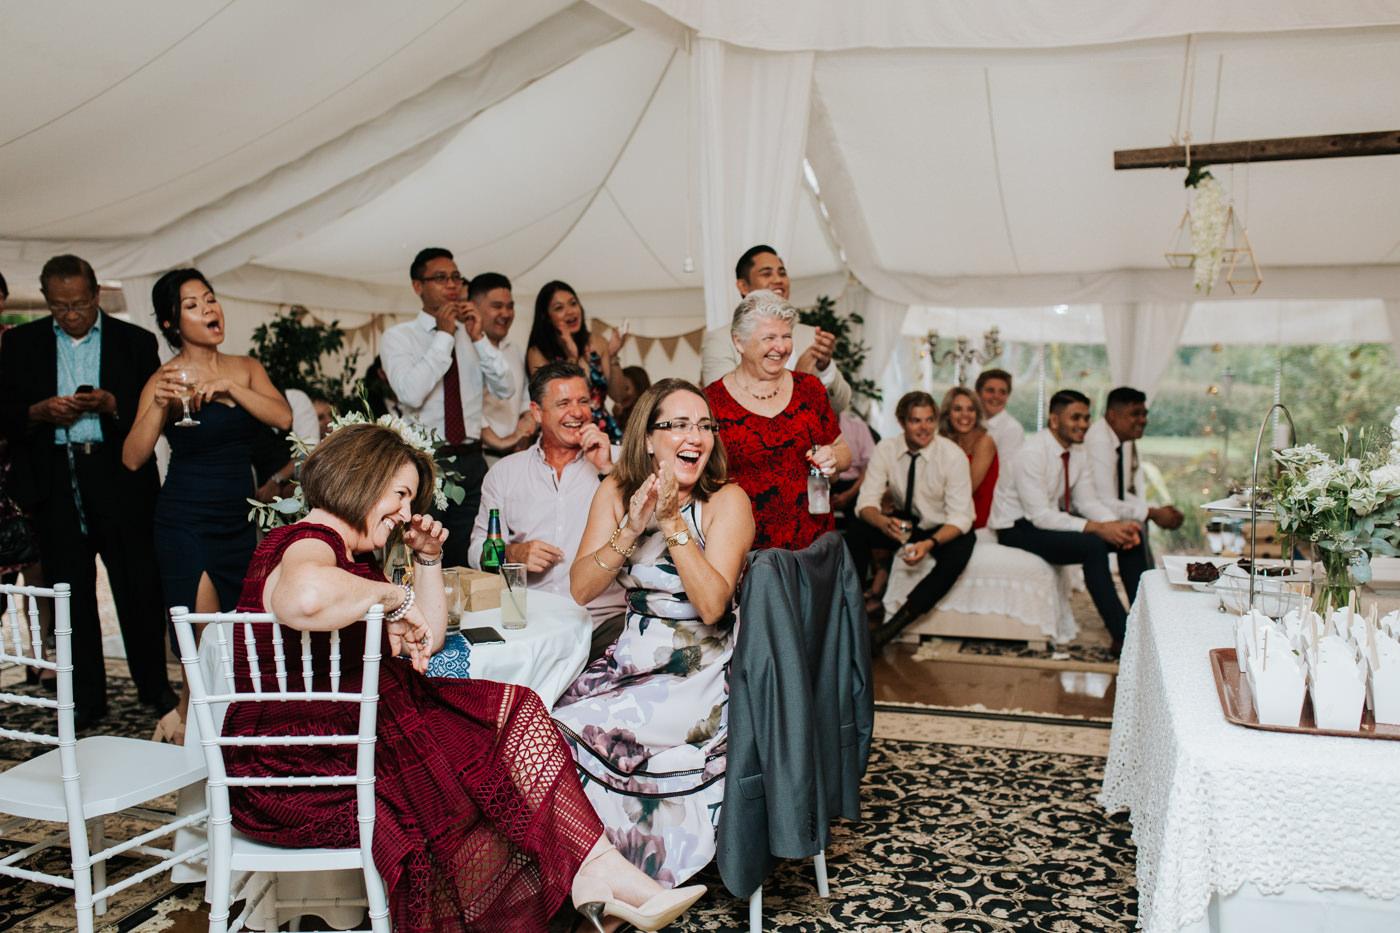 Nick & Vanezza - Fernbank Farm Wedding - Samantha Heather Photography-144.jpg